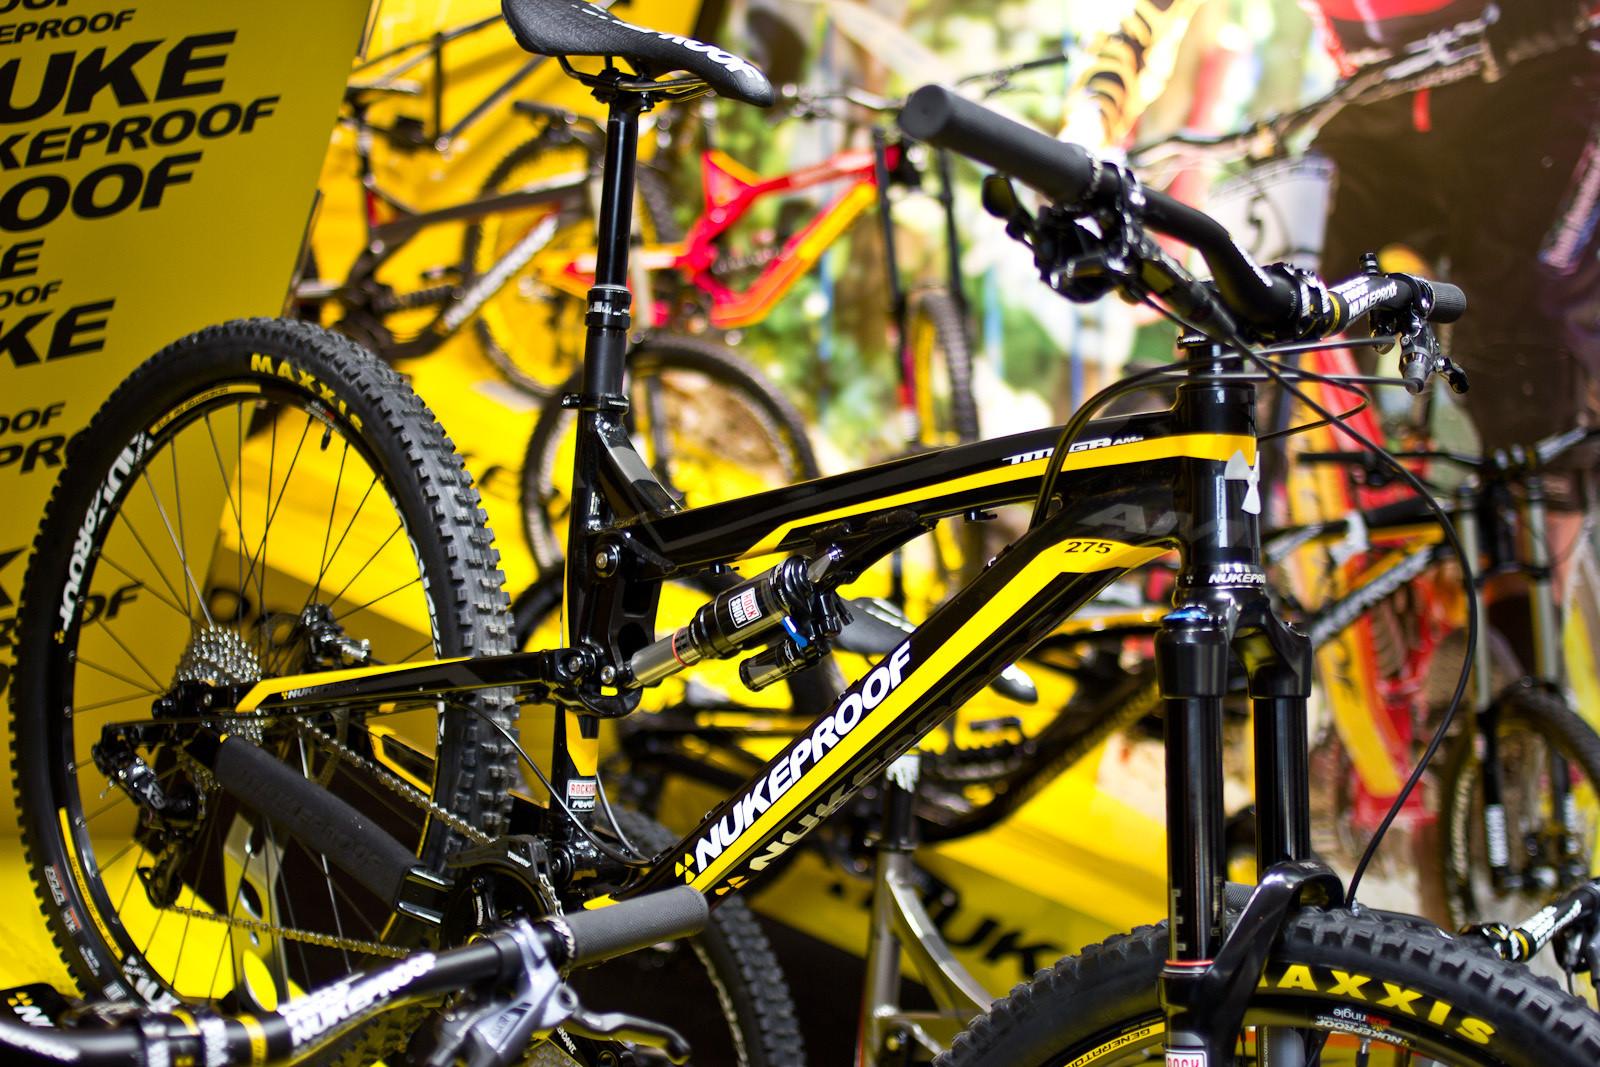 2014 Nukeproof Mega AM 27 5 - 2014 Trail, All-Mountain & Enduro Bikes at Eurobike 2013 - Mountain Biking Pictures - Vital MTB